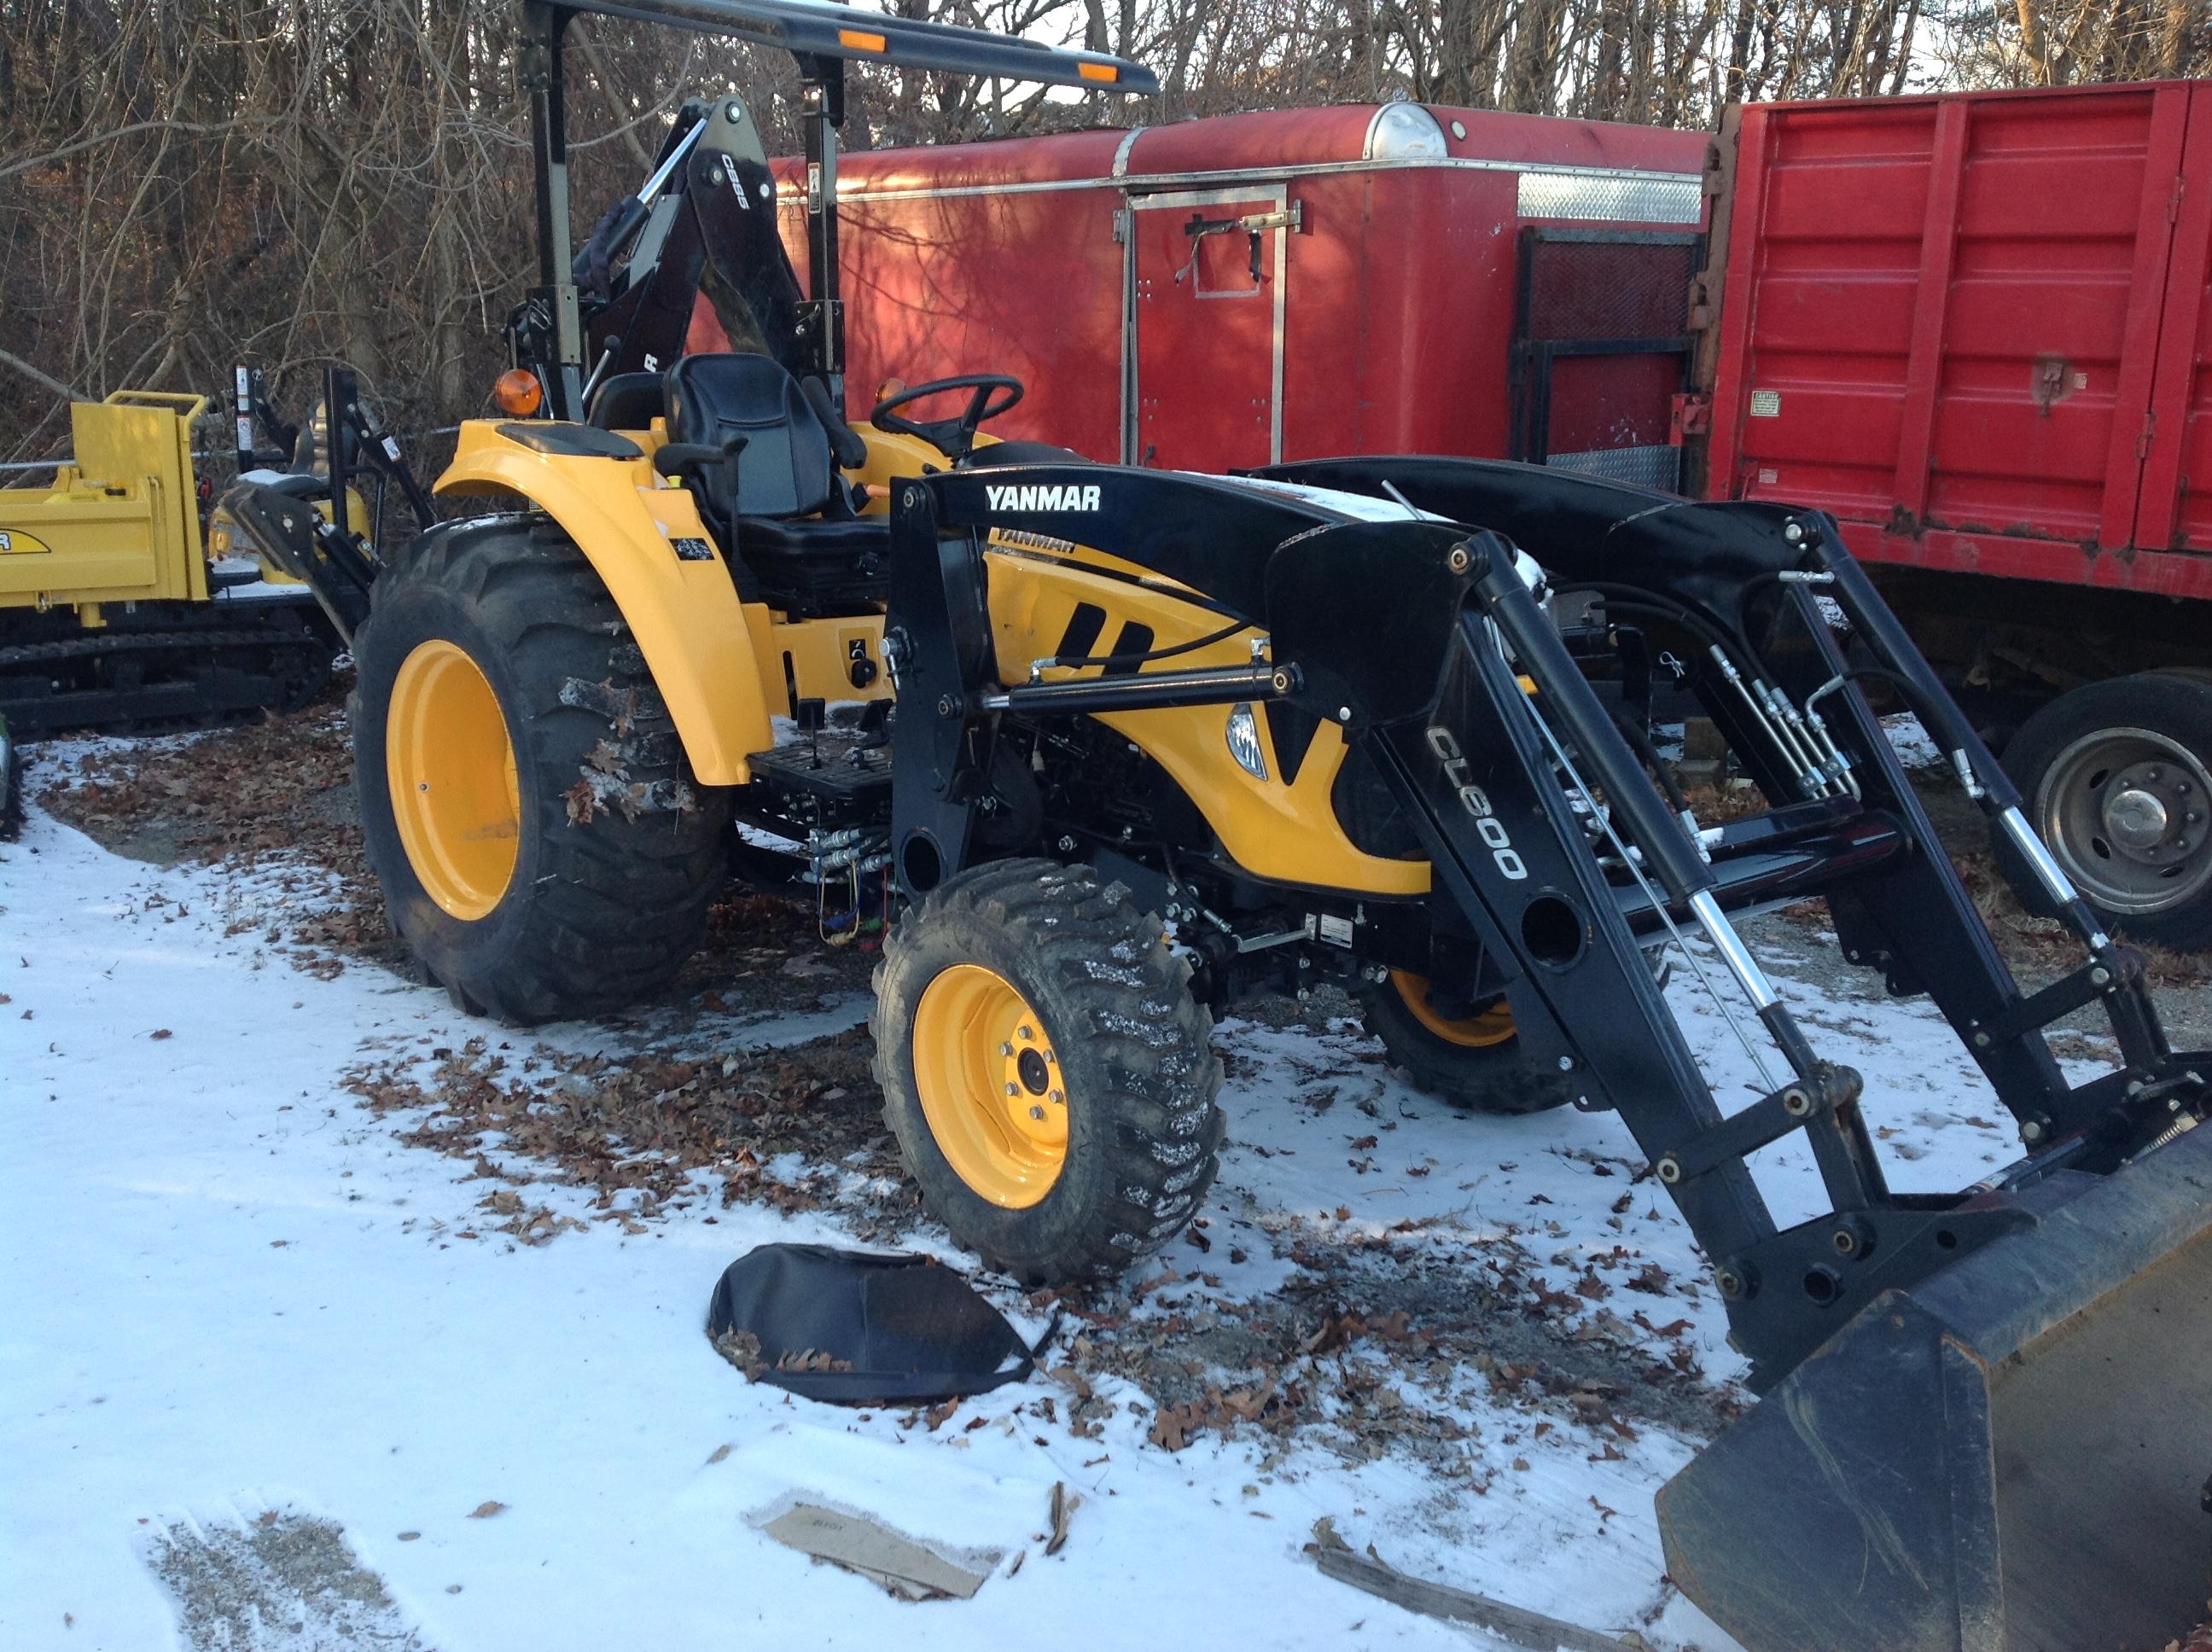 2014 Yanmar Lx4500 Tractor